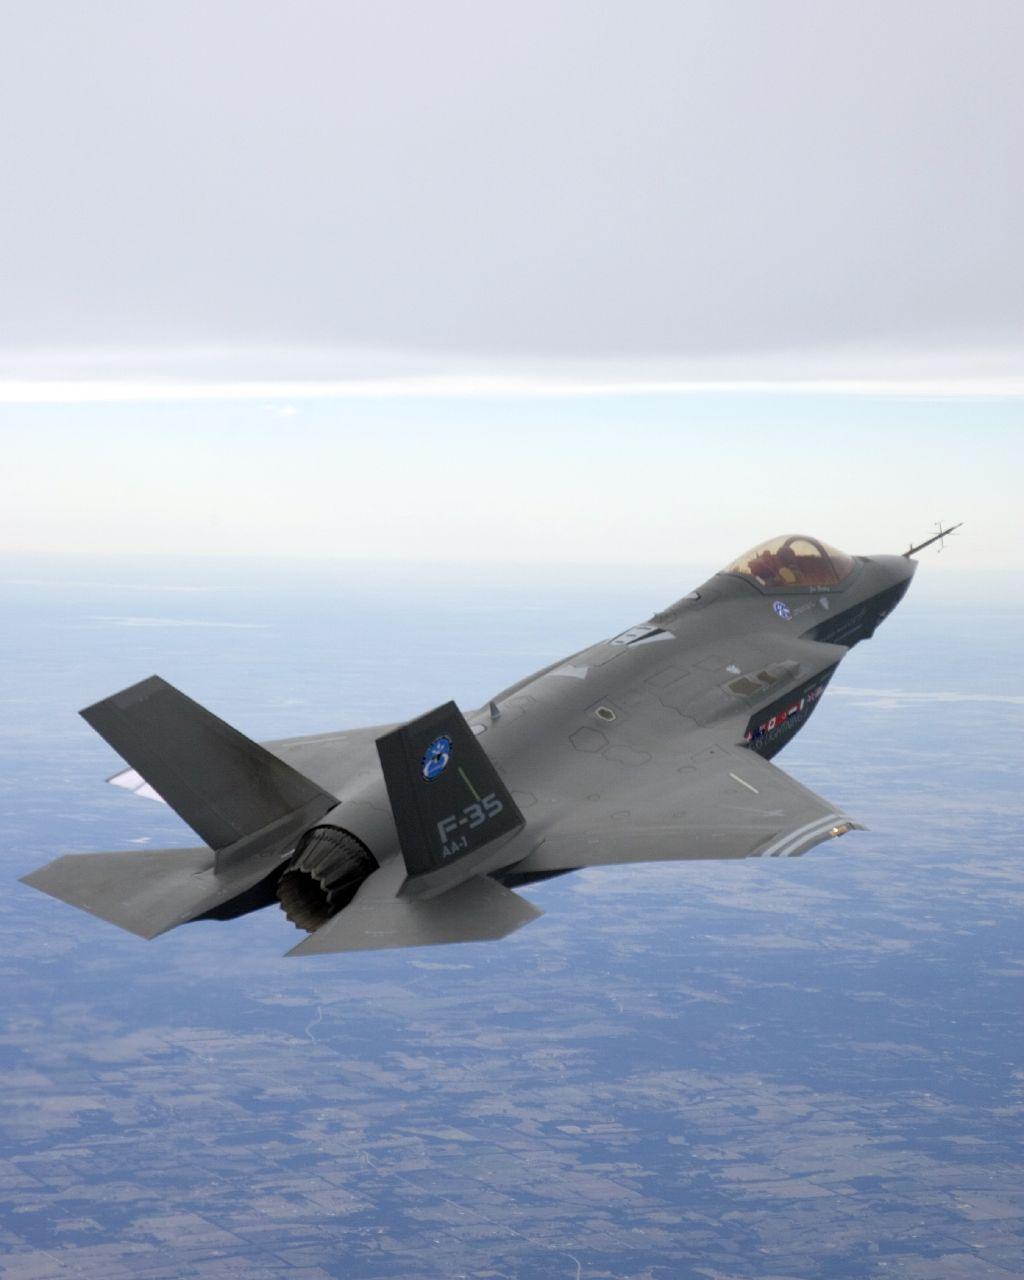 t50/pak fa  ليست شبحيه حتى الان بالتحليل والصور والمصادر  - صفحة 2 F-35_JSF_1